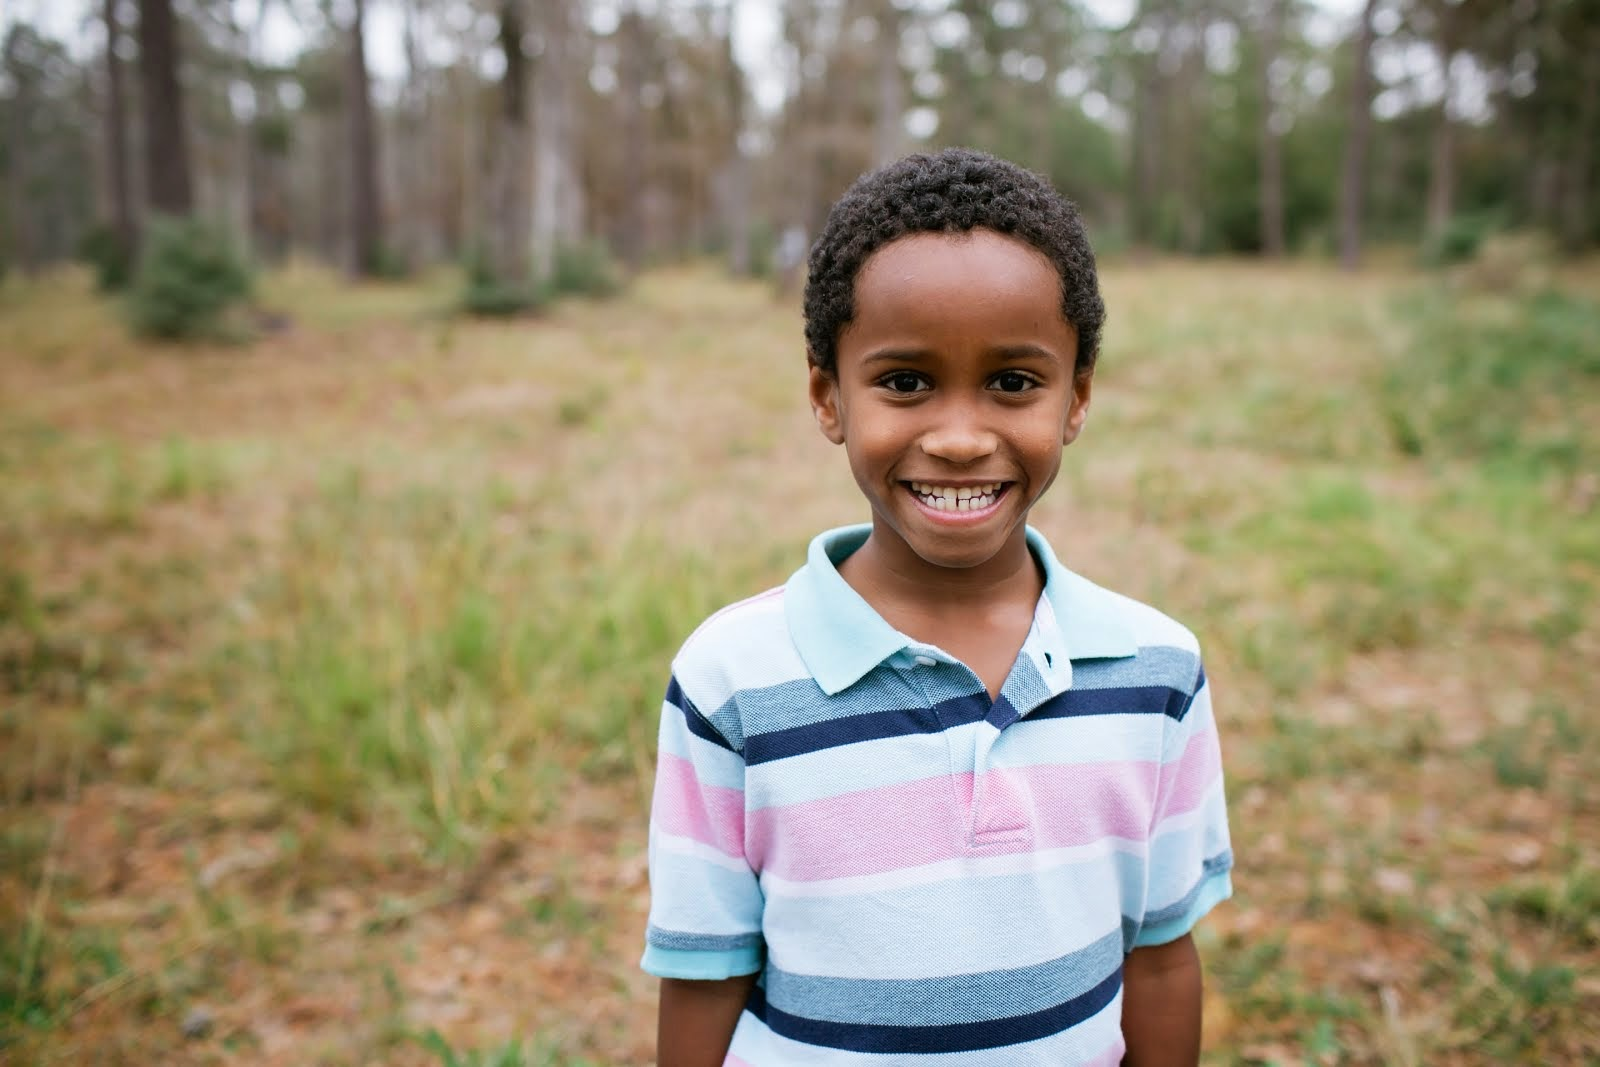 Ivan, age 7